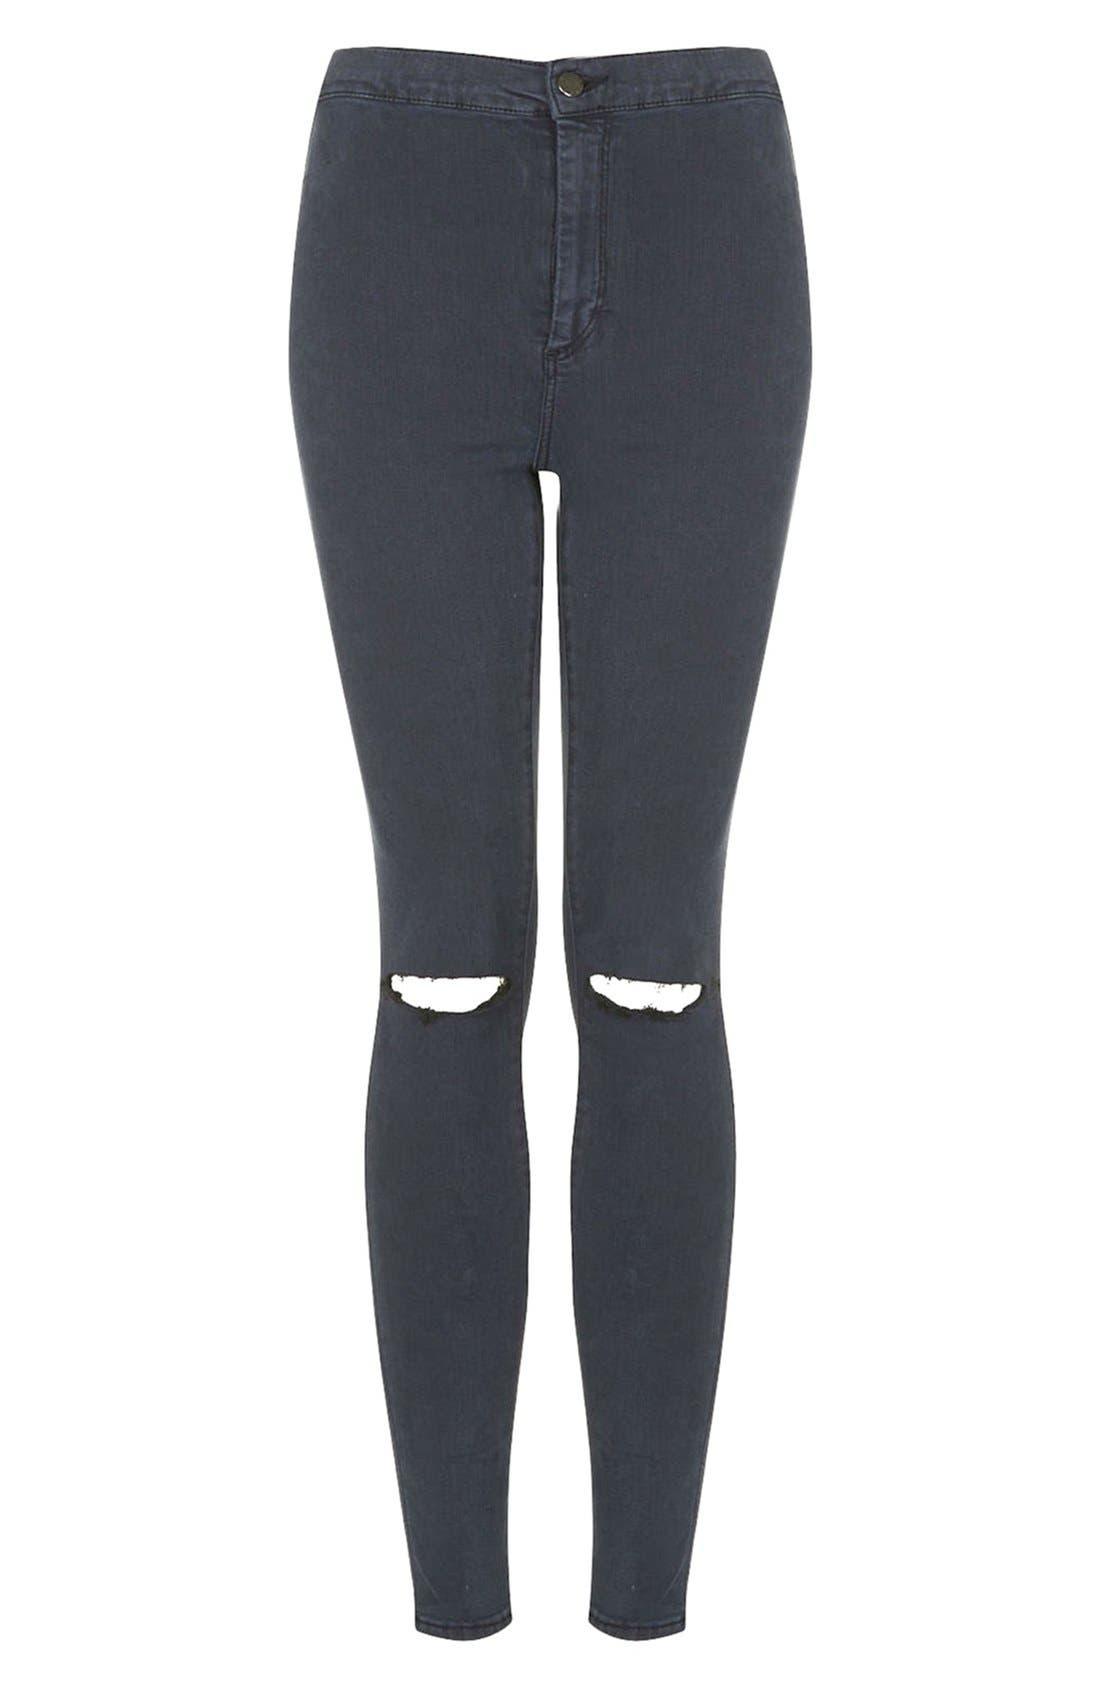 Alternate Image 3  - Topshop Moto 'Joni' Ripped Jeans (Blue) (Regular & Short)